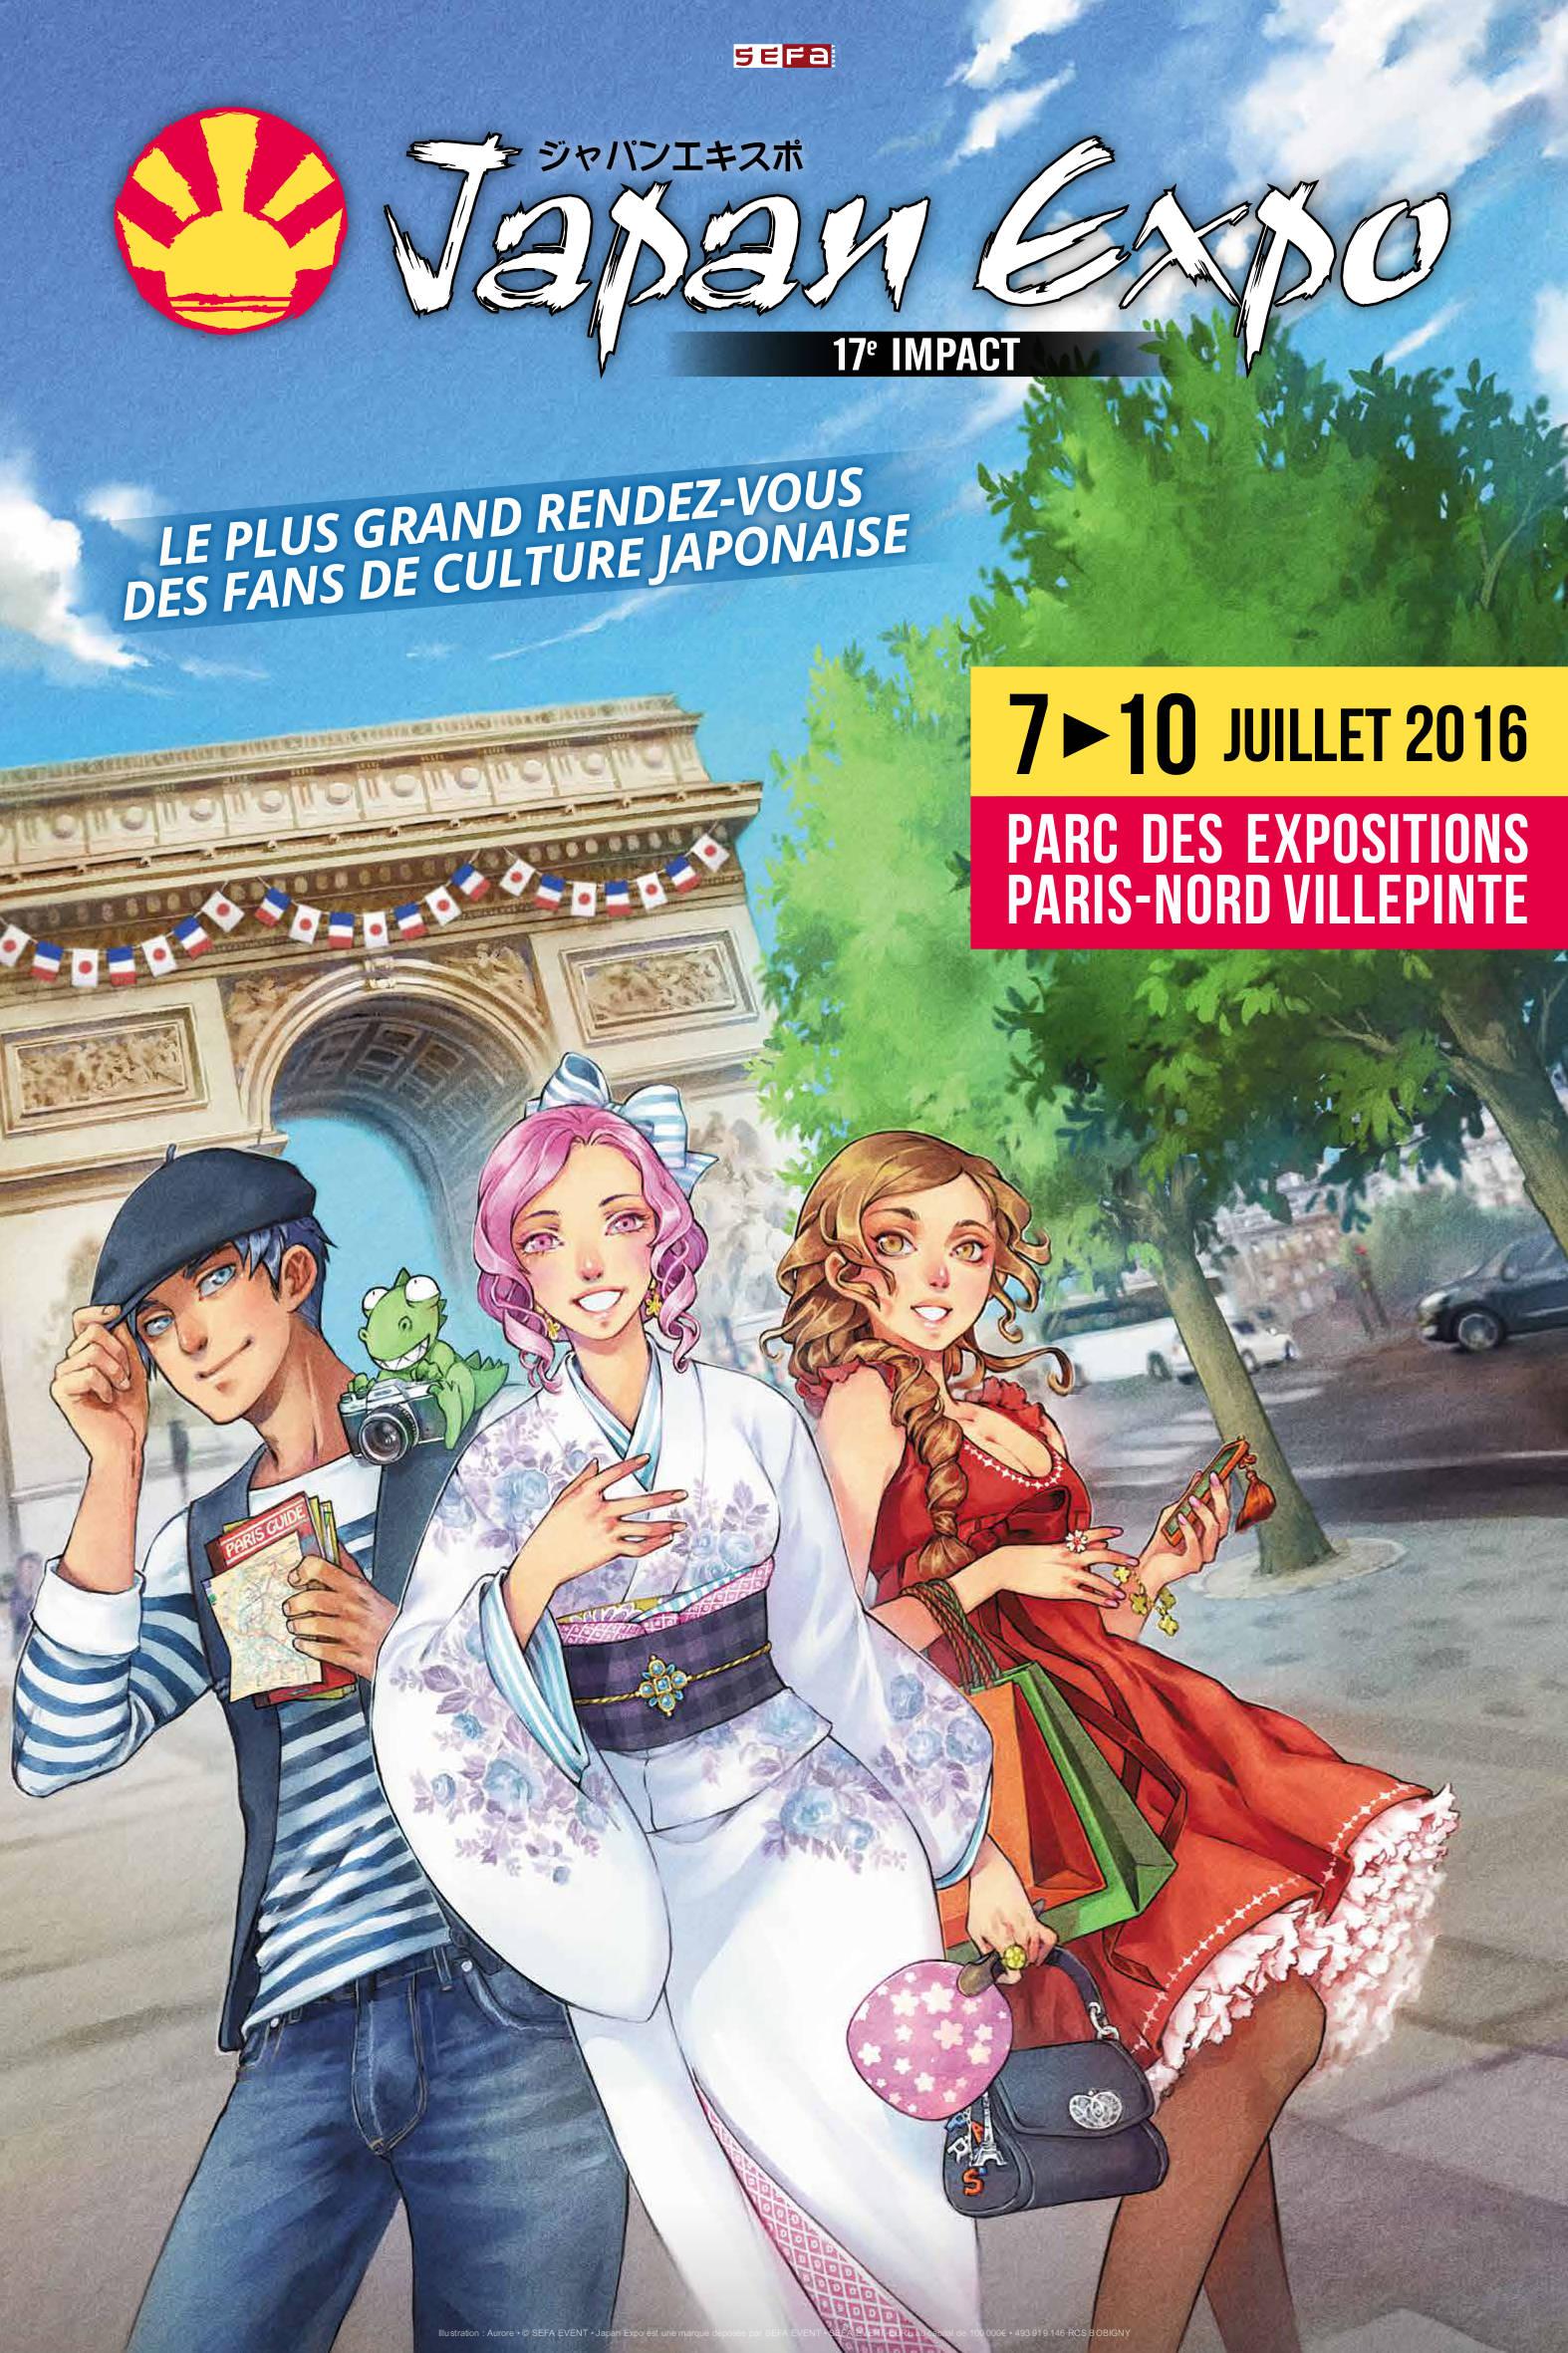 Convention Japan Expo 17 Paris Thomas Cyrix